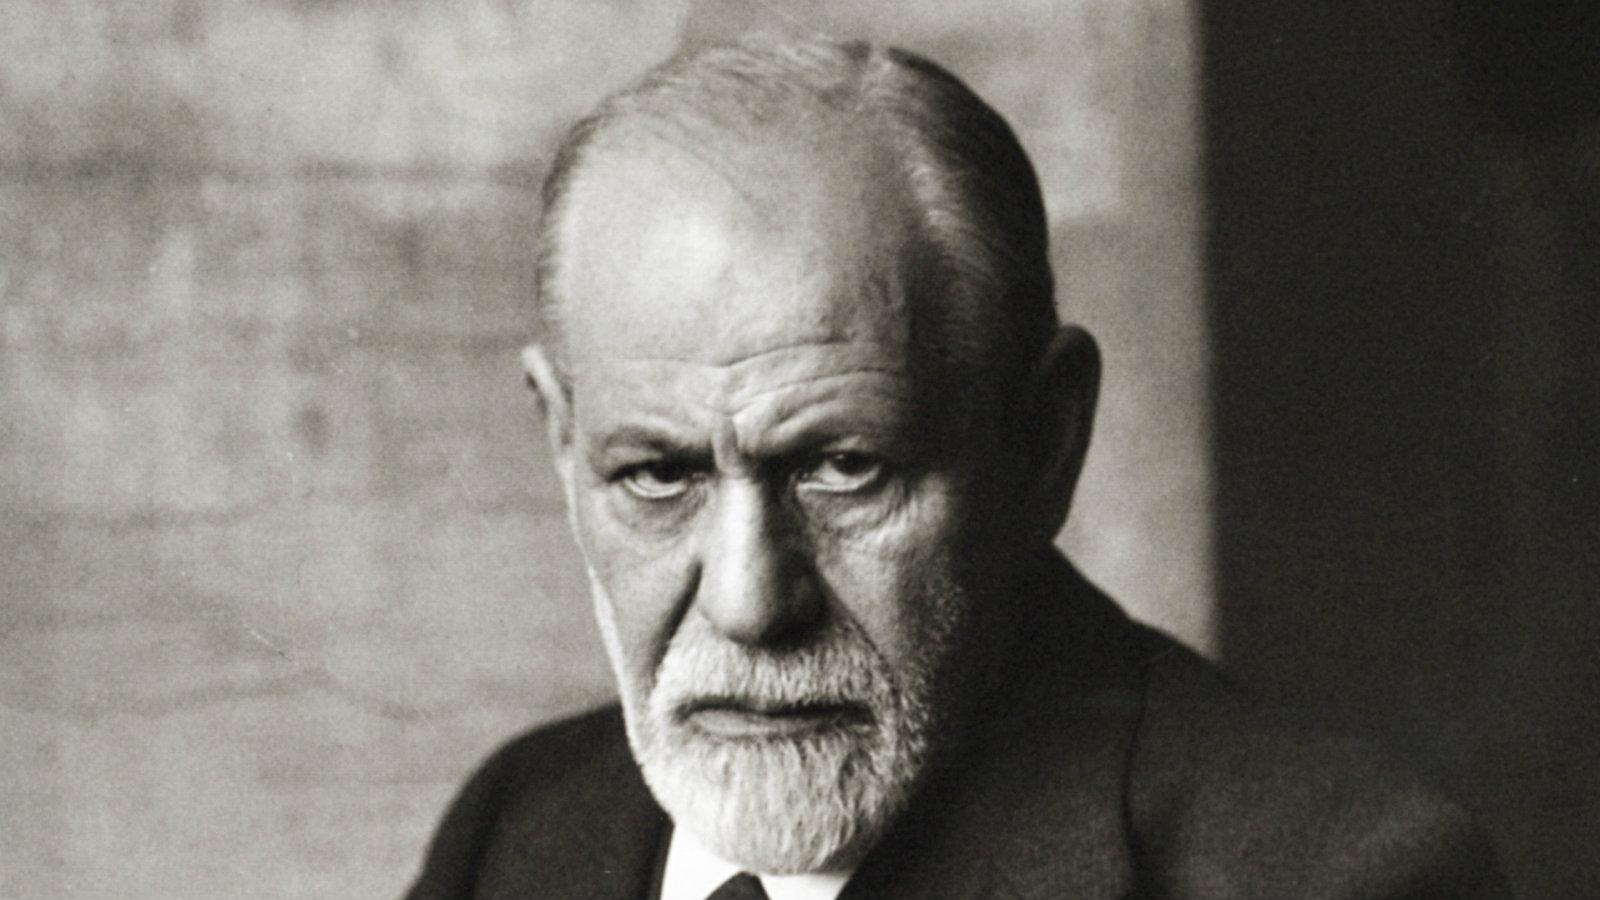 Another Sigmund Freud